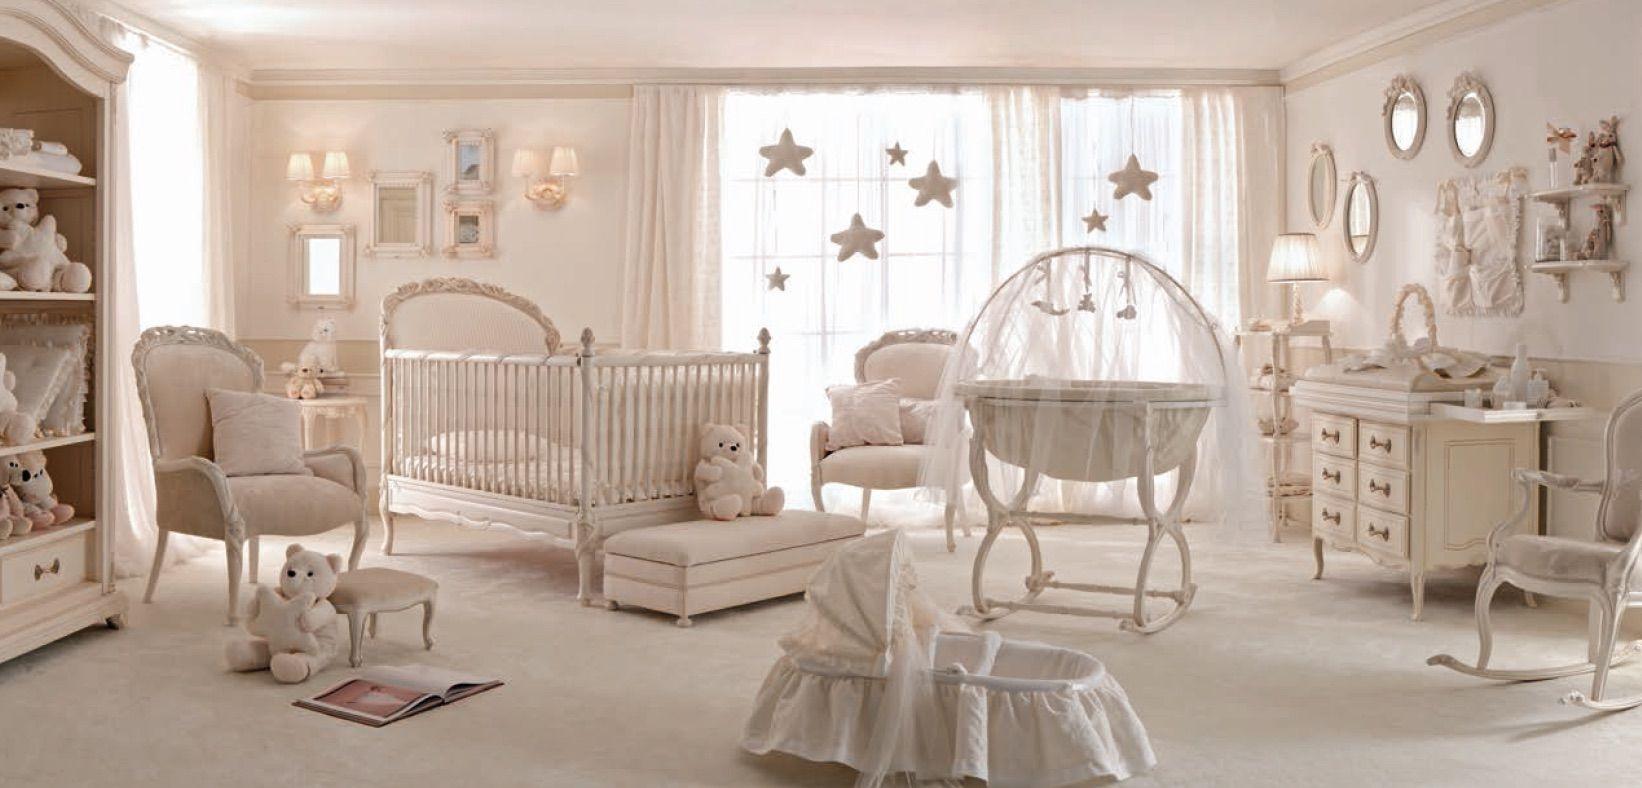 Newborn Kamar Tidur Anak Anak Kamar Bayi Kembar Ruangan Bayi Luxury newborn baby room